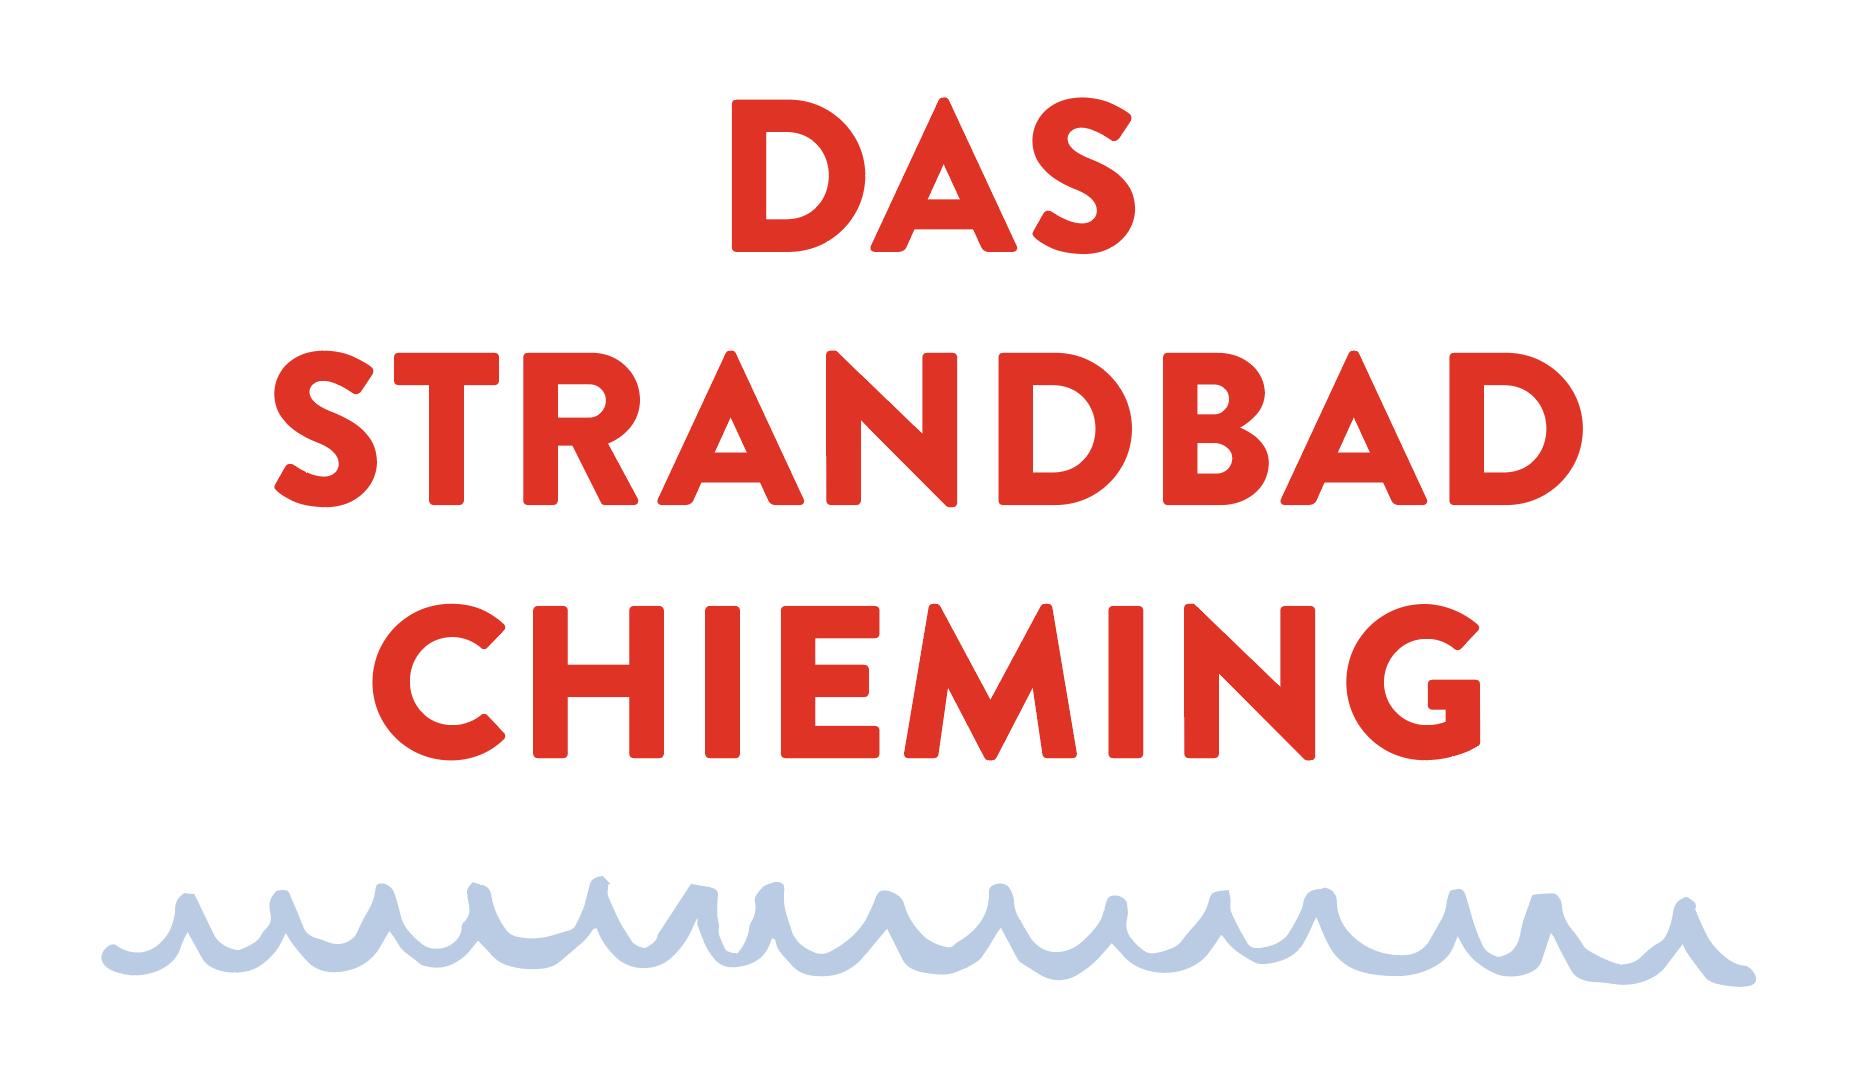 STRANDBAD CHIEMING